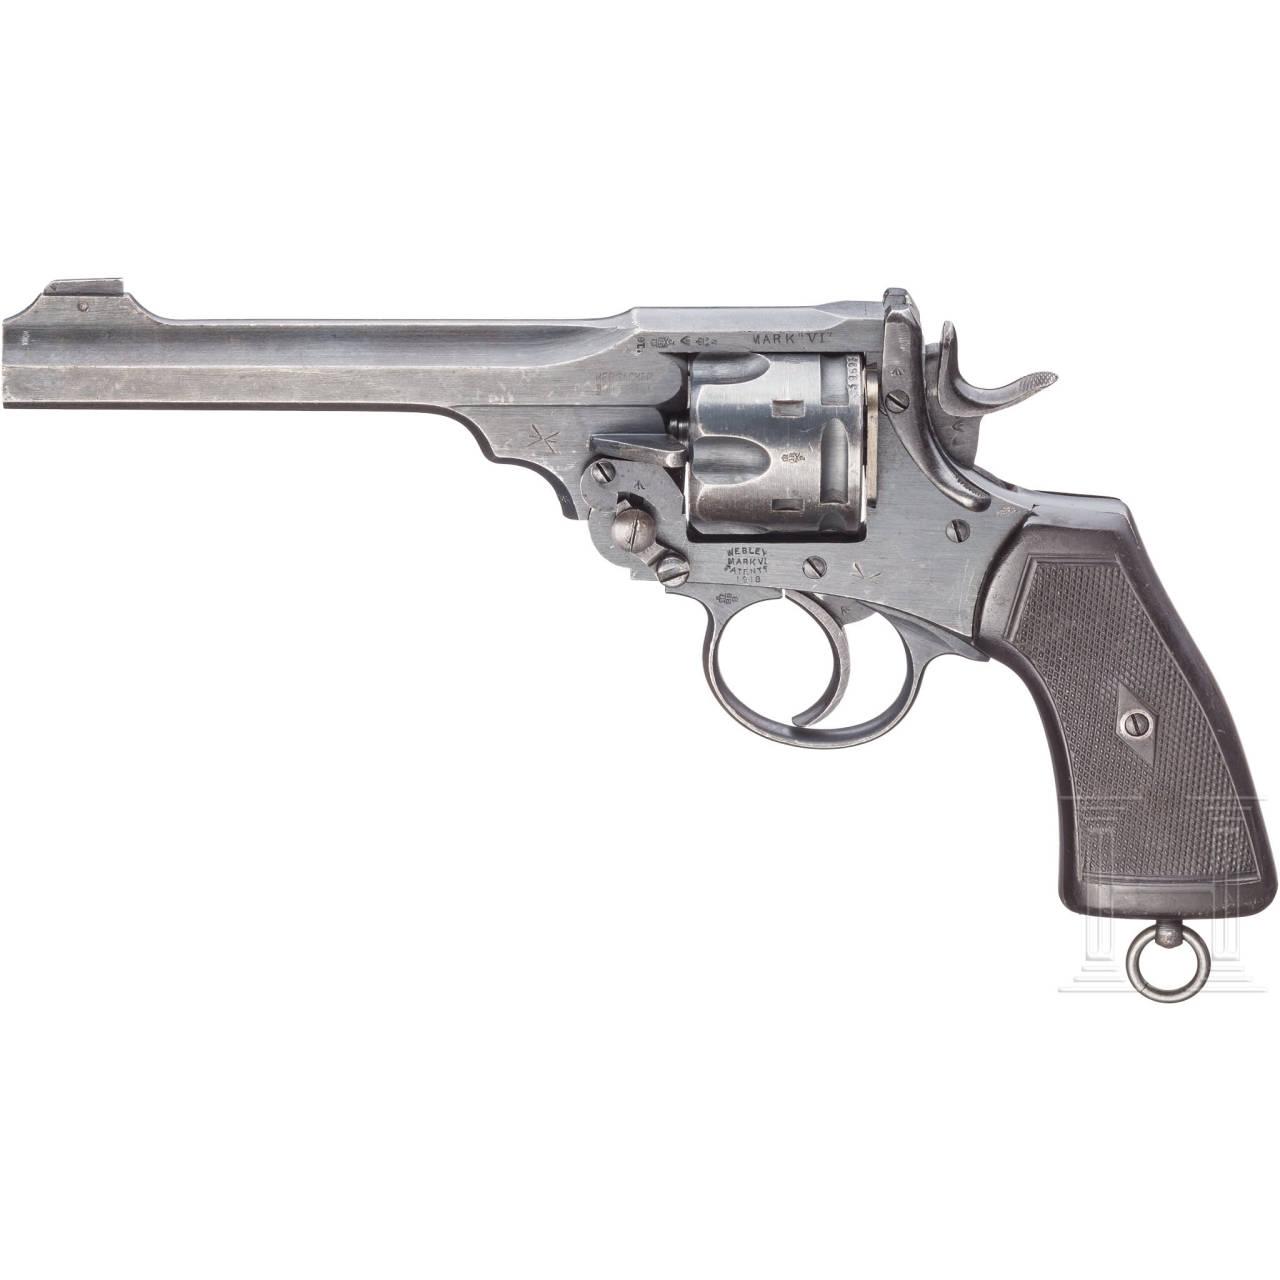 "Webley Mark VI Service Revolver with Shoulder Stock Attachment (""Grabenrevolver"")"